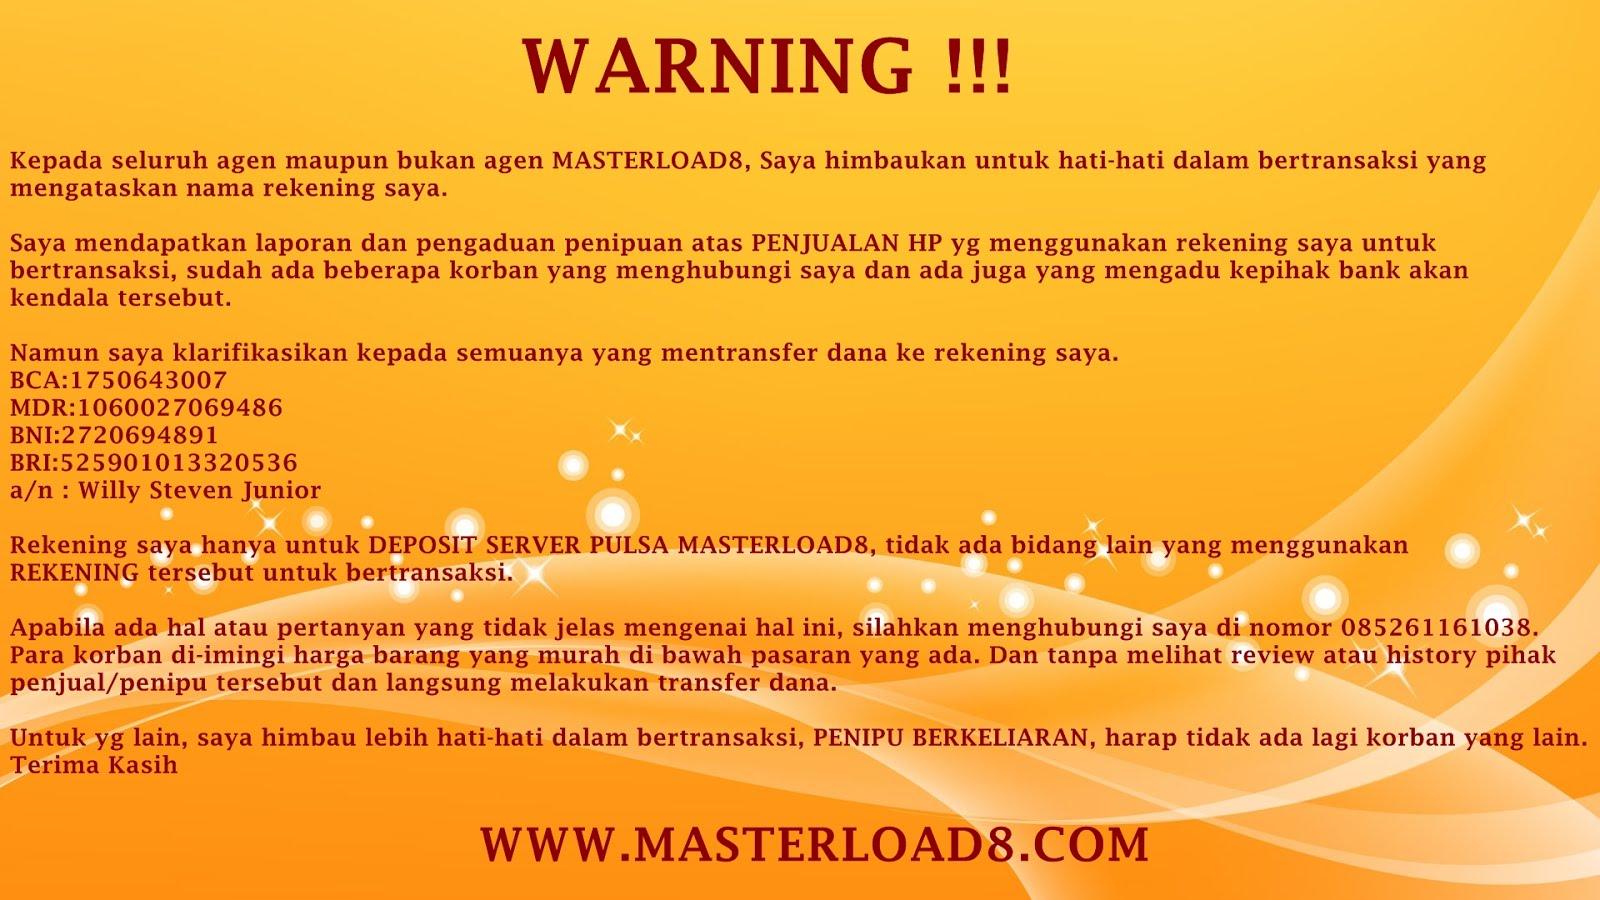 Warning Modus Penipuan Yang Mengatasnamakan Rekening Masterload8